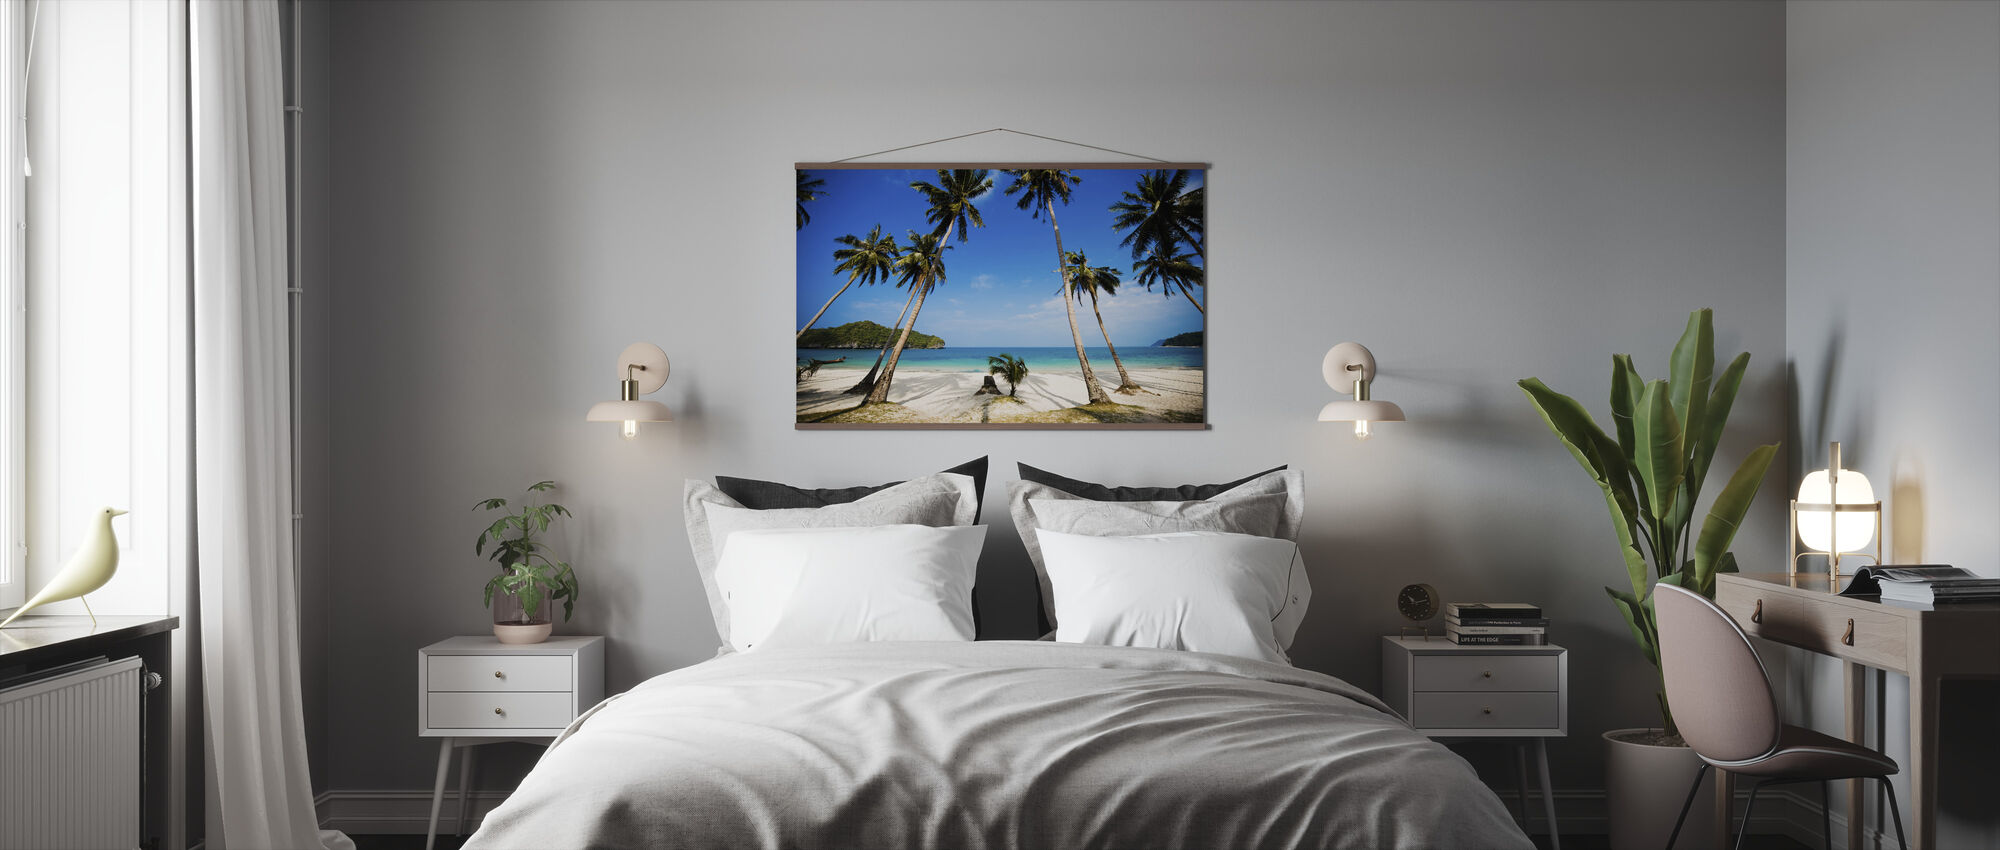 Kokospalmen, Thailand - Poster - Slaapkamer